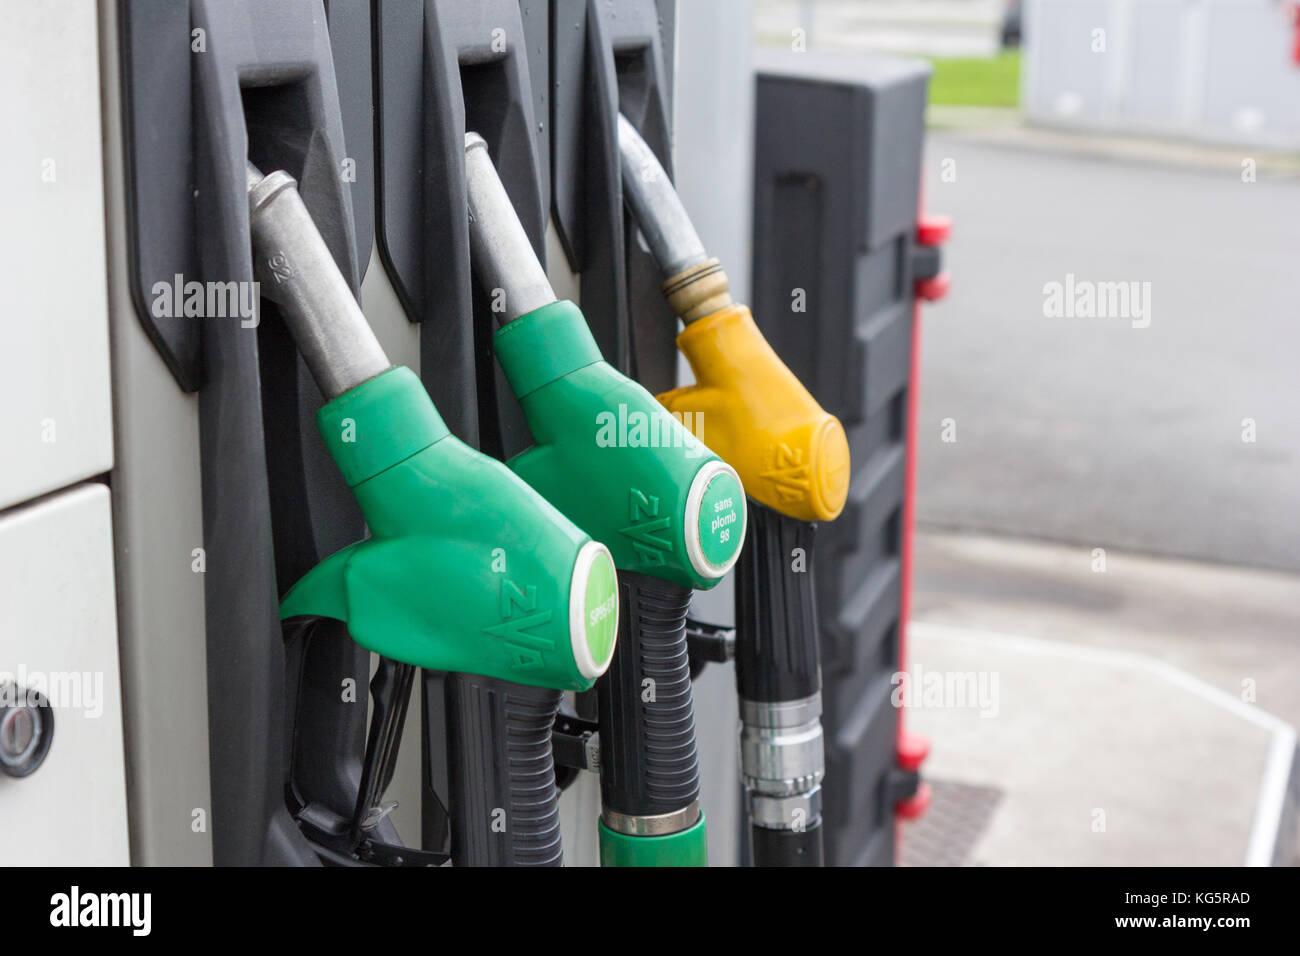 Gas filling nozzles (guns) at a gas station. Stock Photo